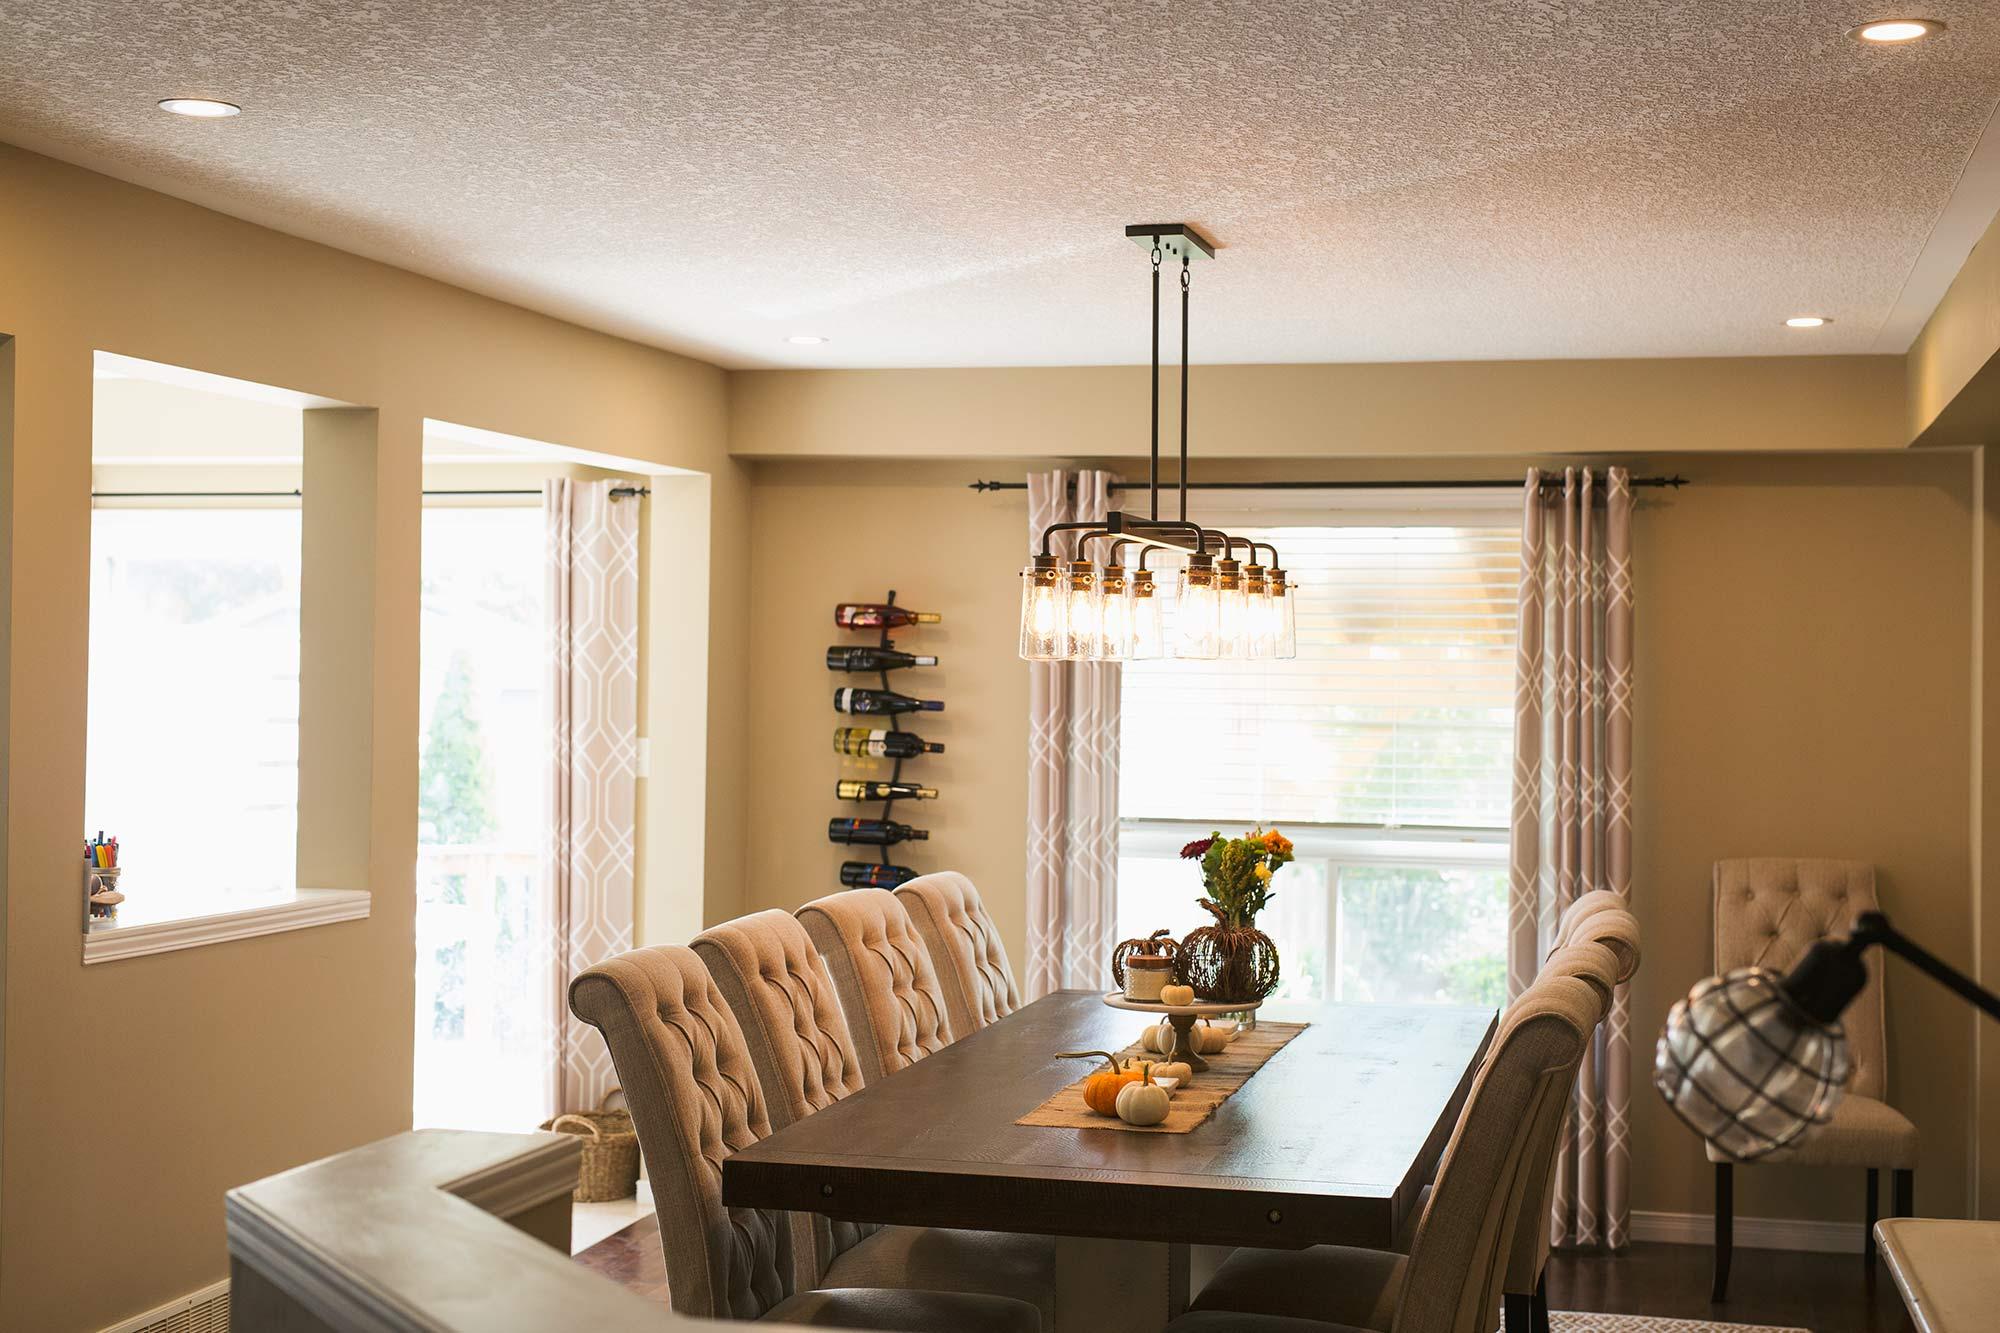 after-dining-room-light-installed